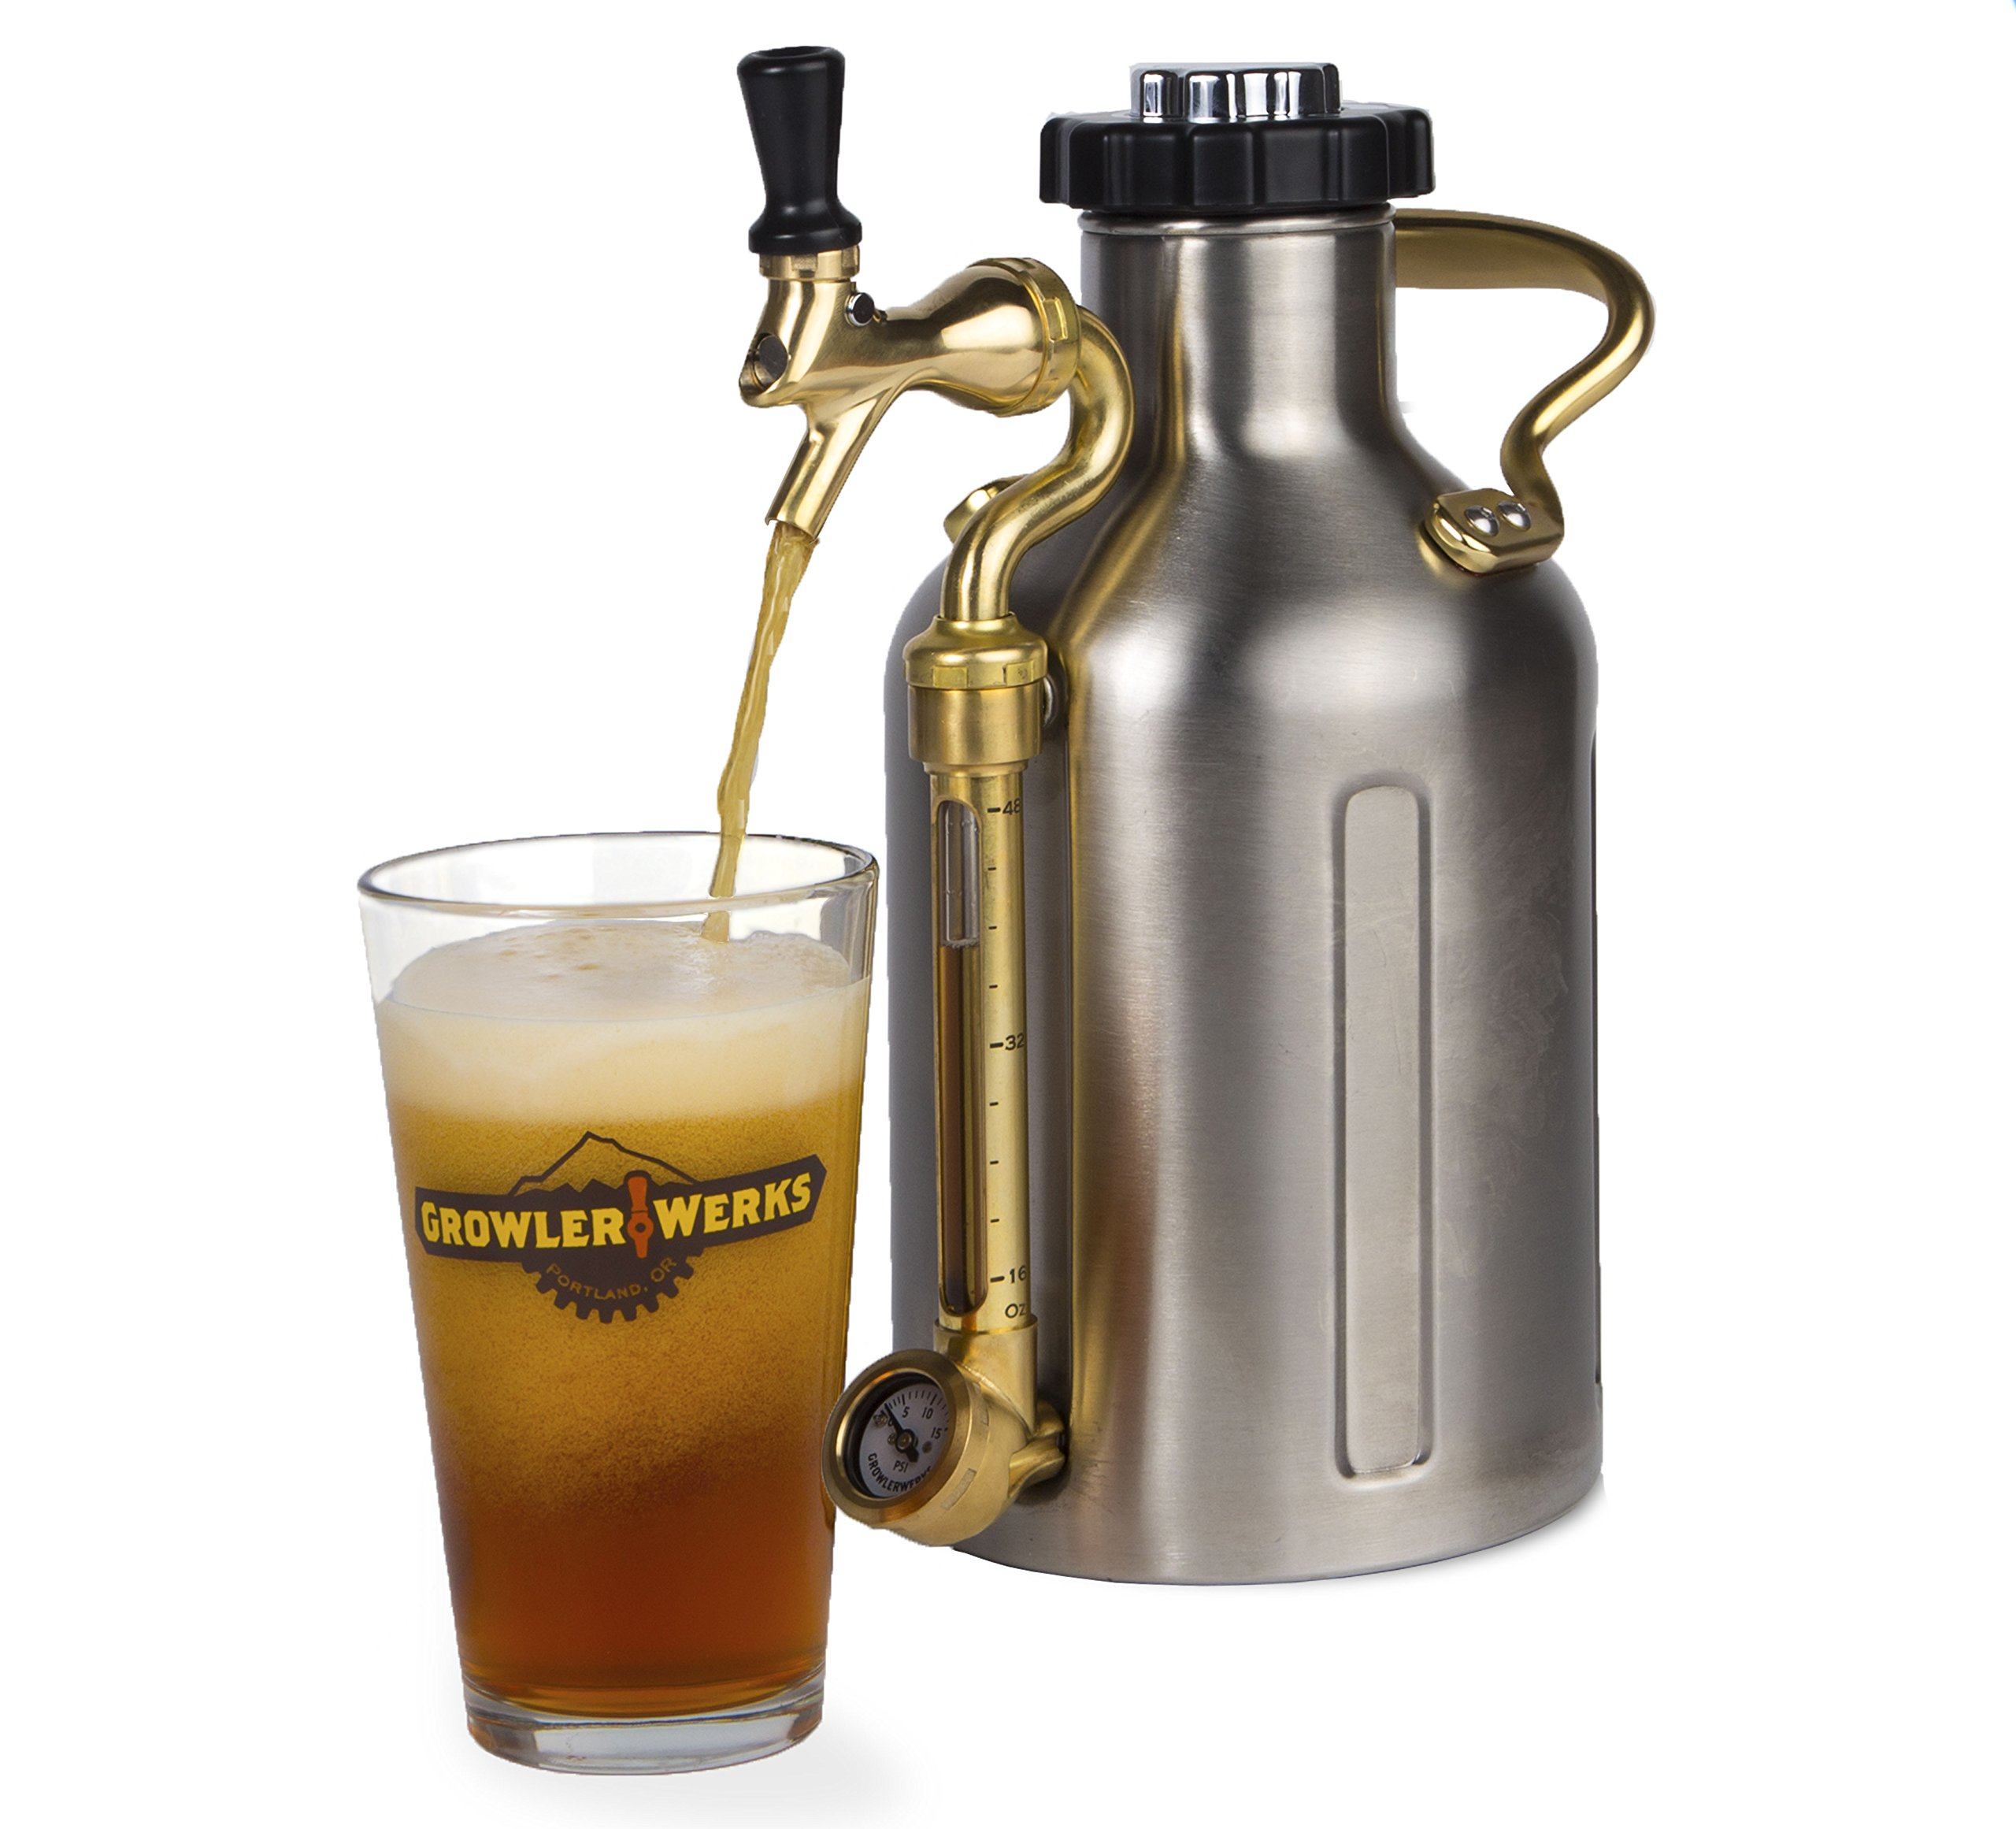 uKeg 64 oz Pressurized Growler for Craft Beer - Stainless Steel by GrowlerWerks (Image #4)